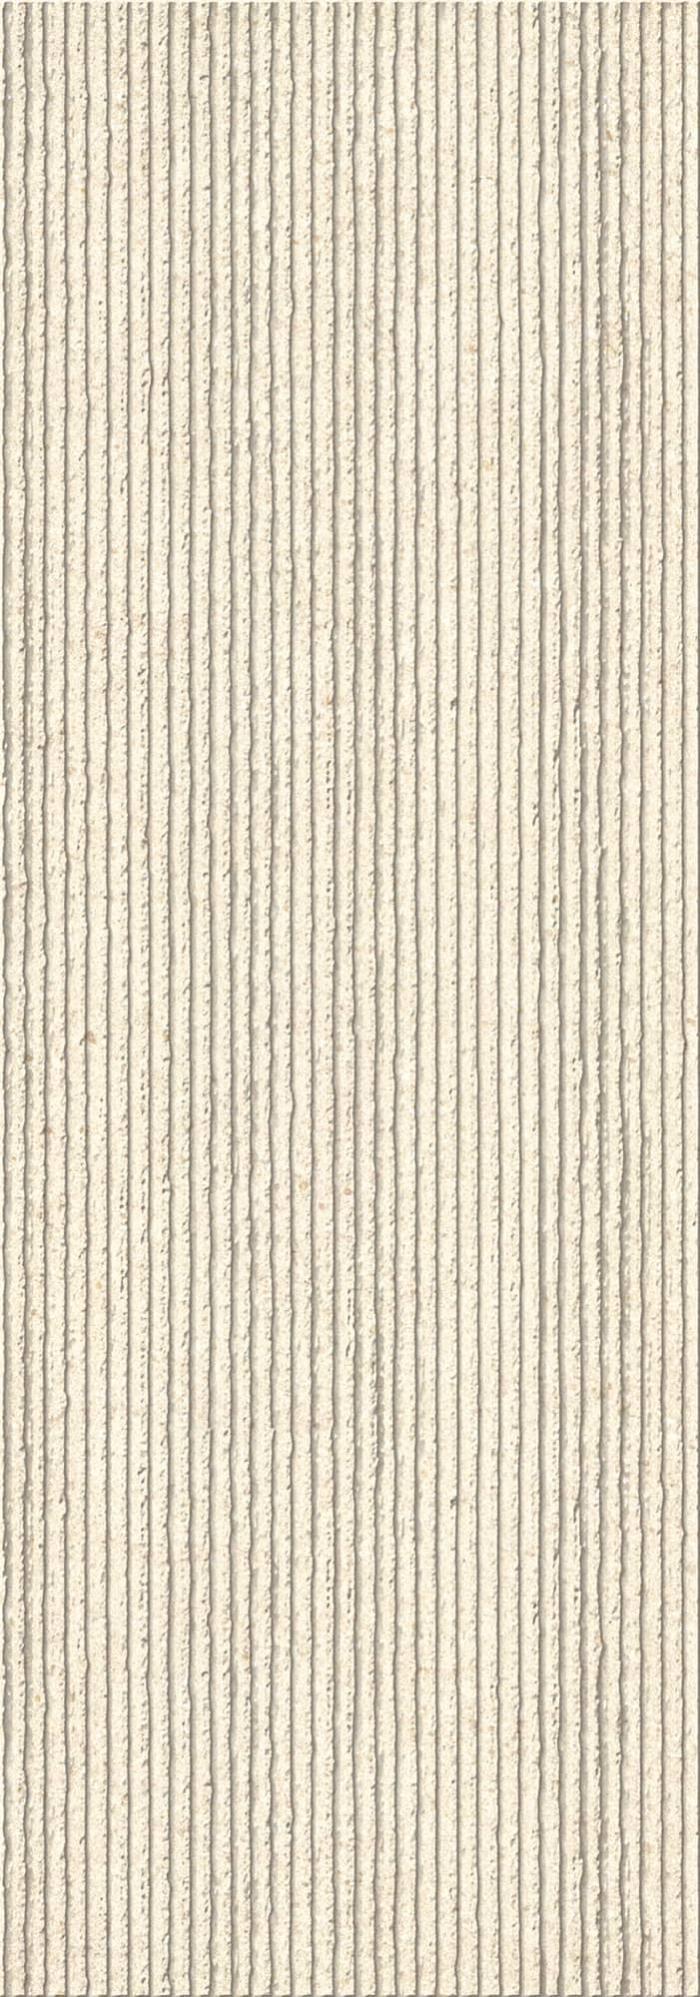 Lining White